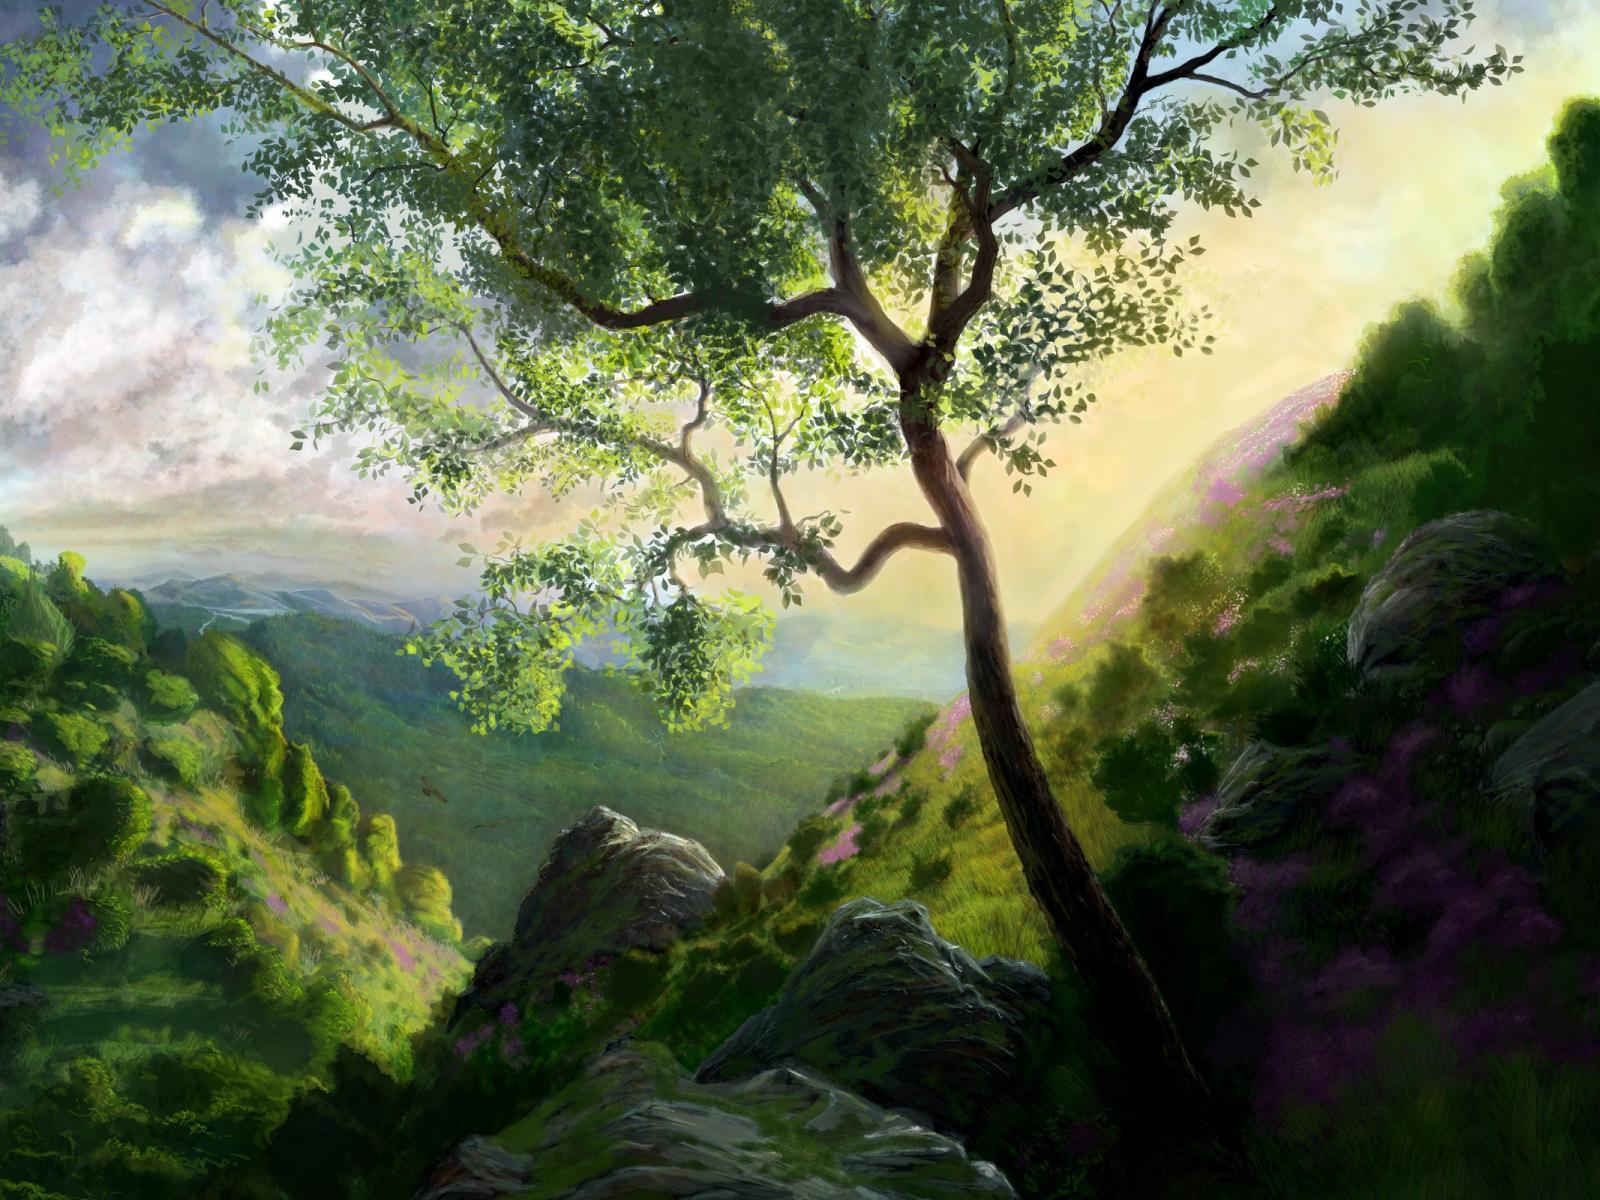 Drawn background desktop Artwork background nature artwork widescreen